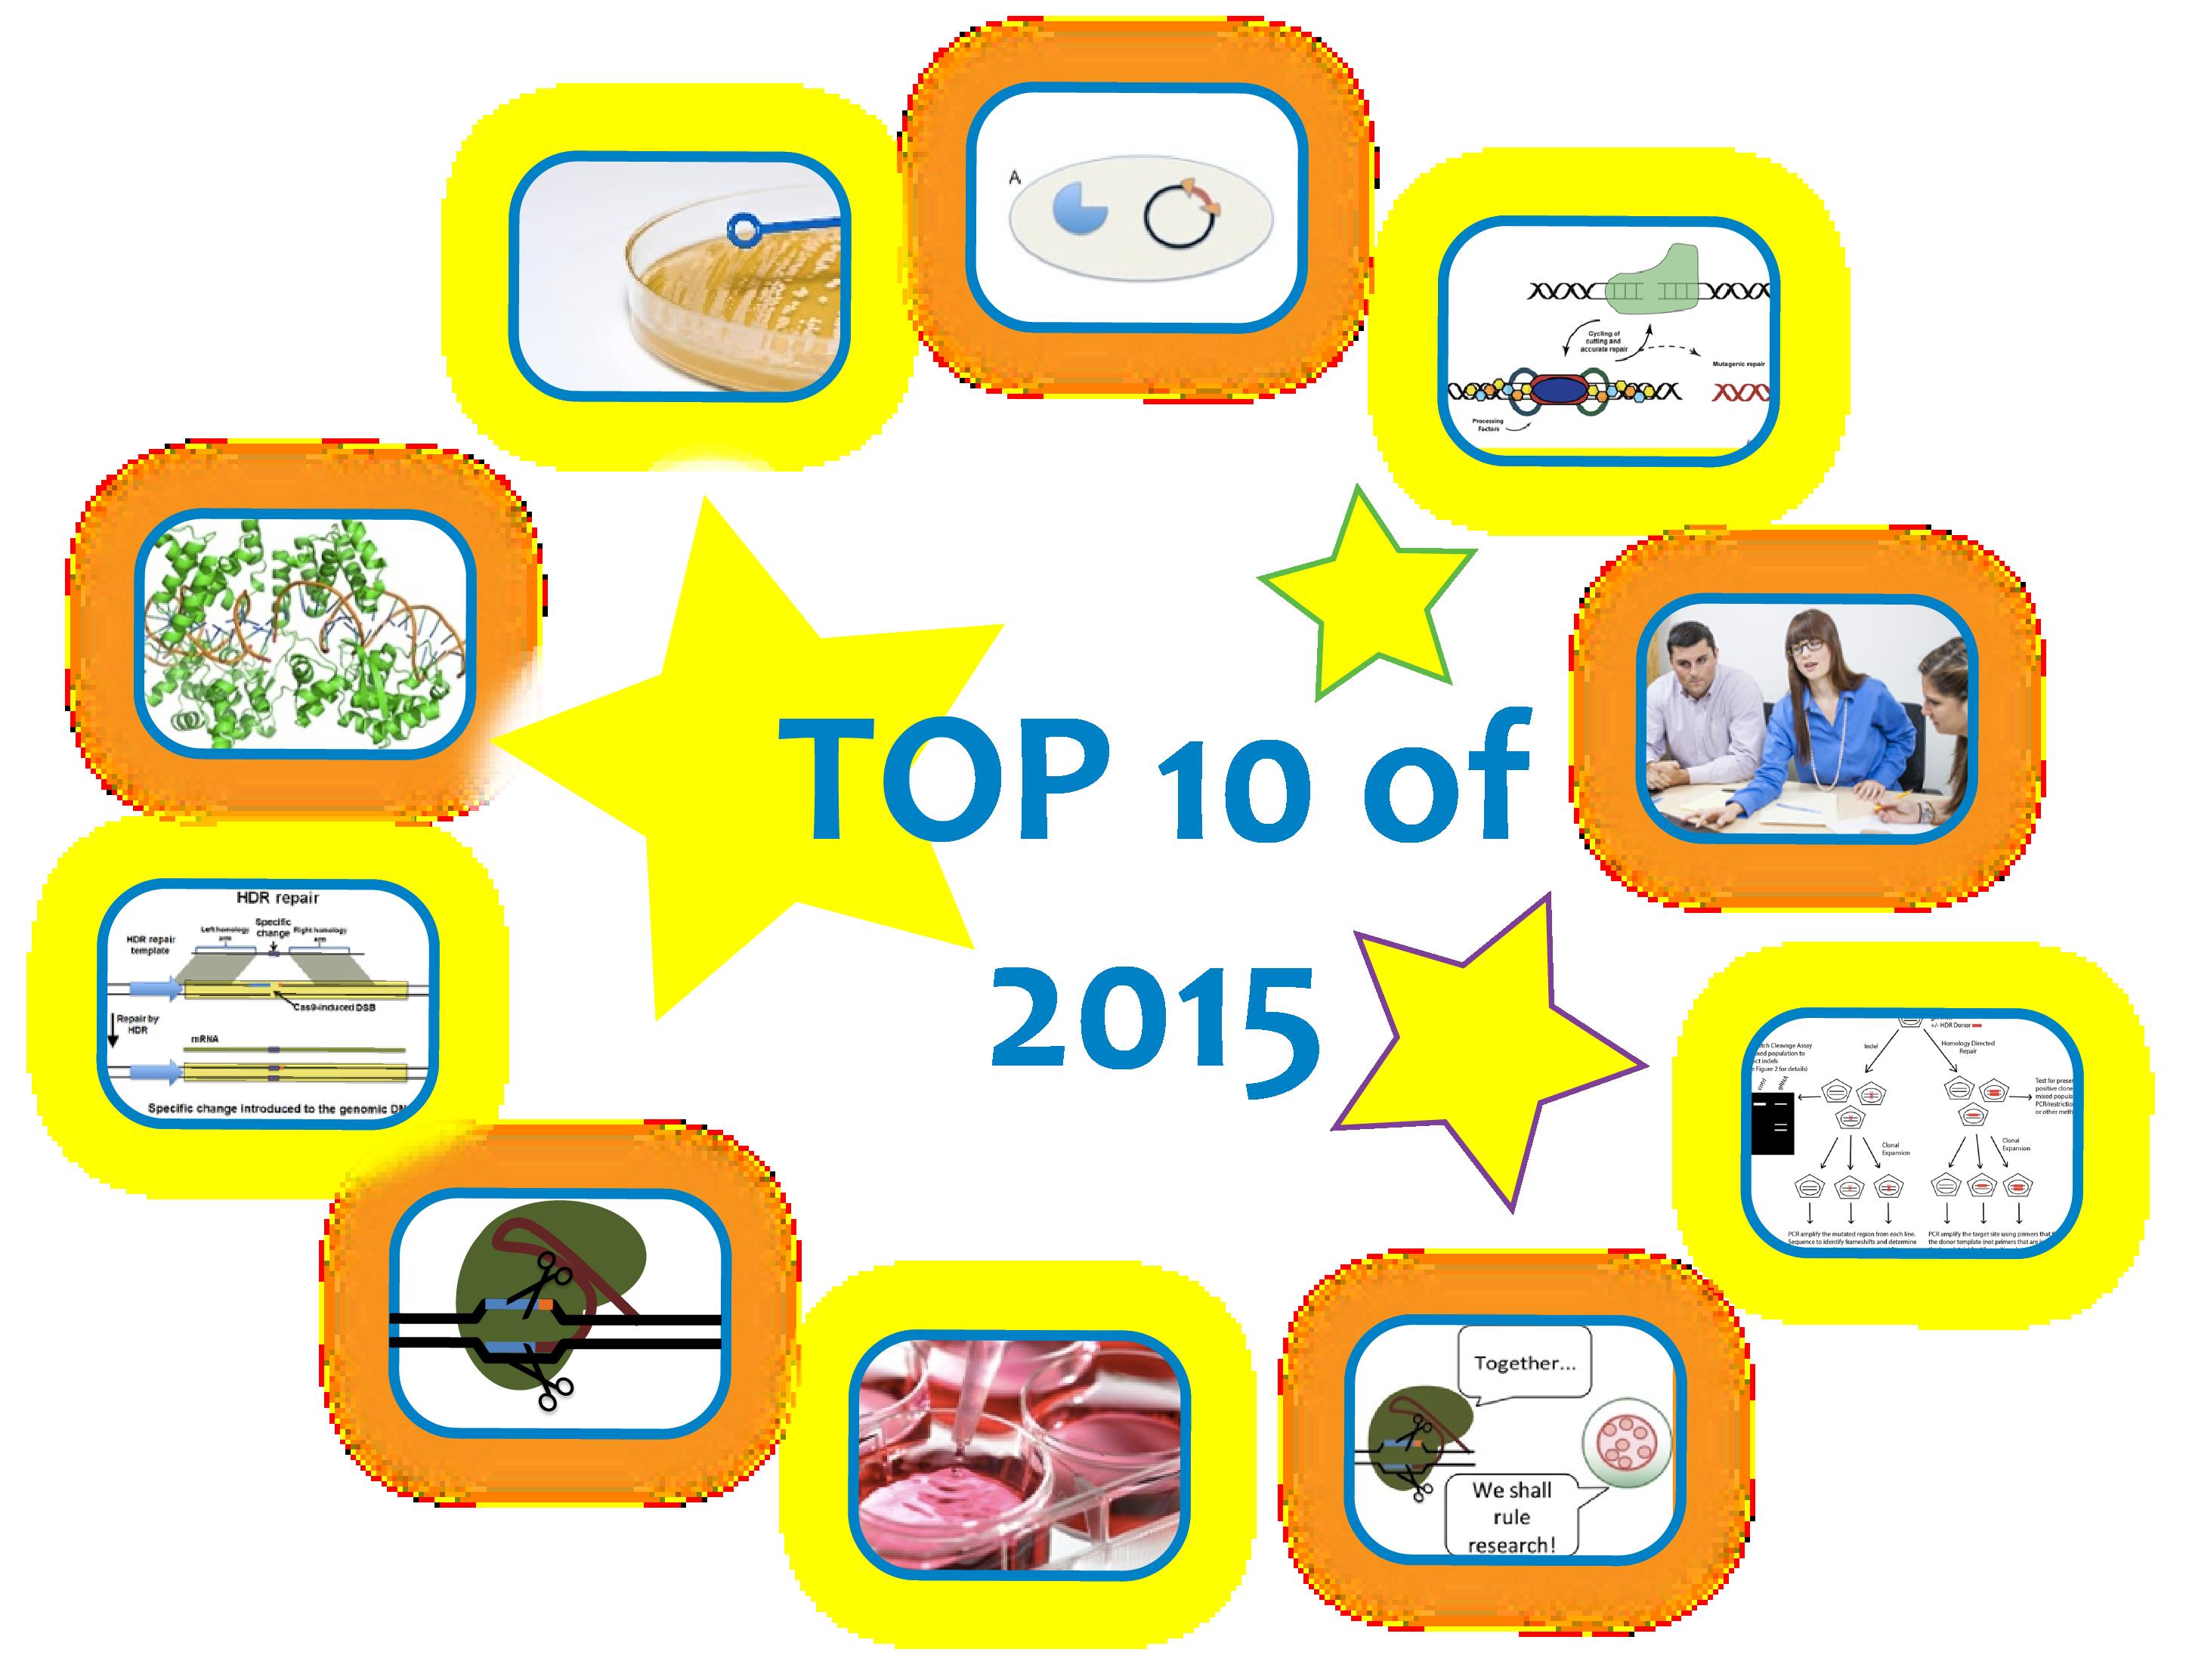 Top_10_Blog_Posts_of_2015.png